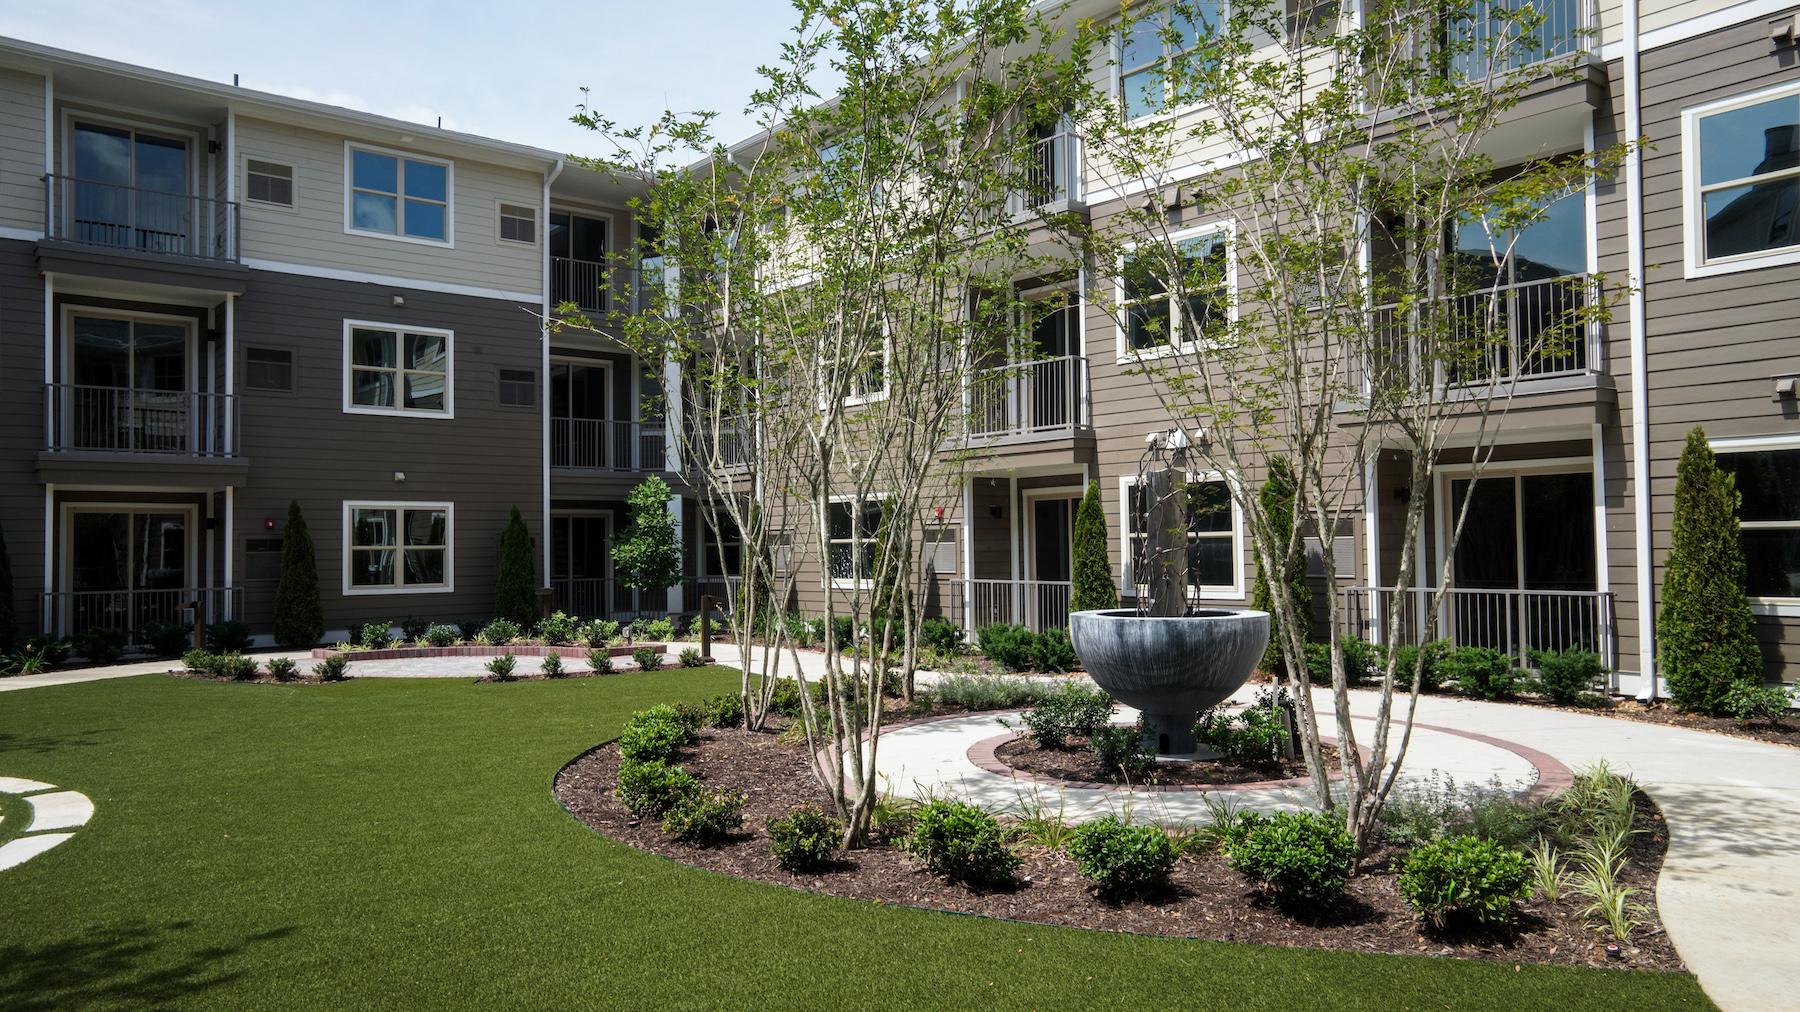 Senior living community landscape and pathway